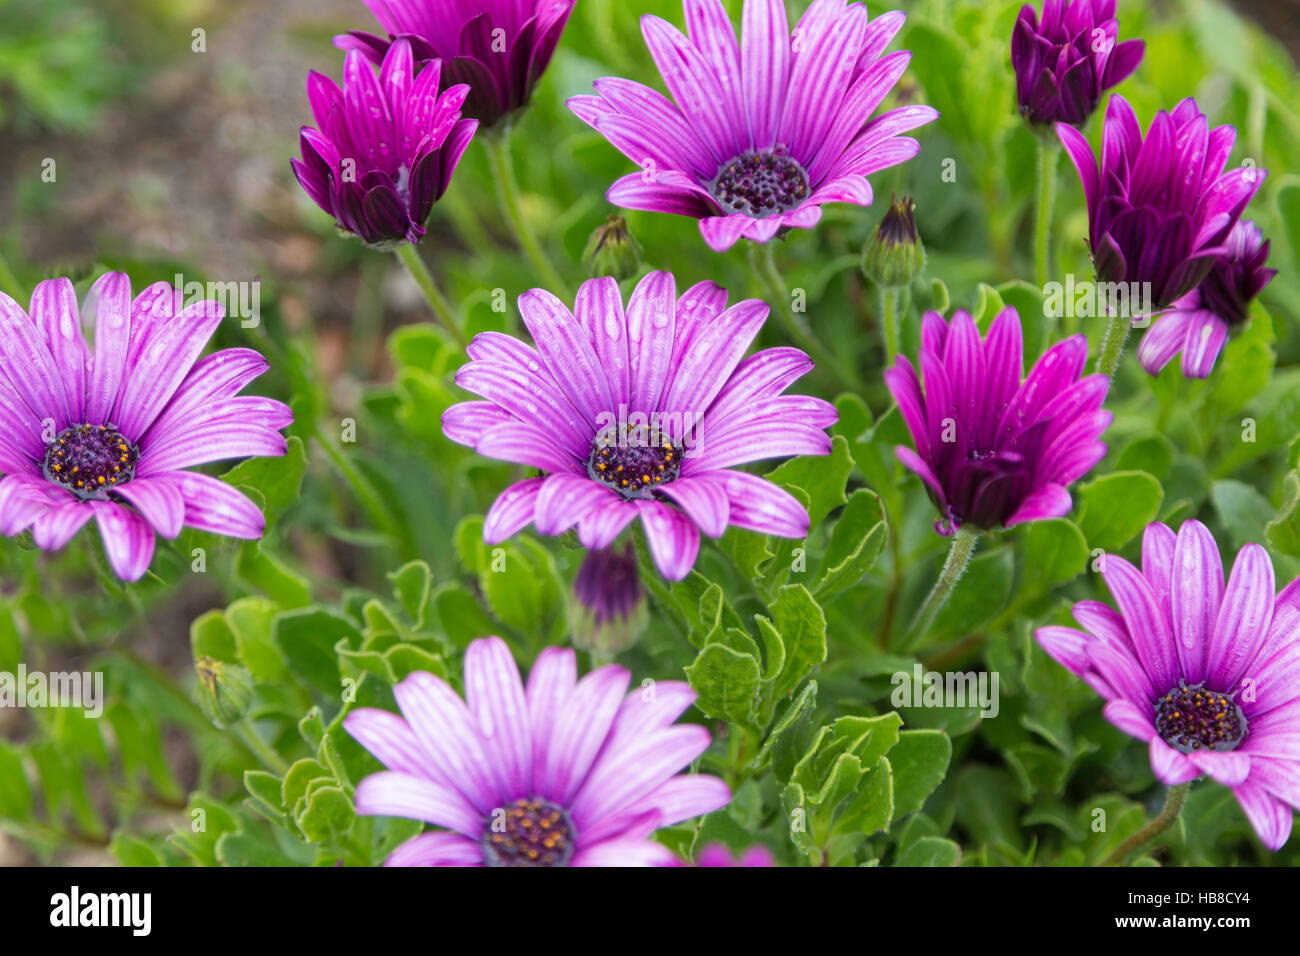 Purple Daisy Flowers With Rain Drops And Green Foliage Stock Photo